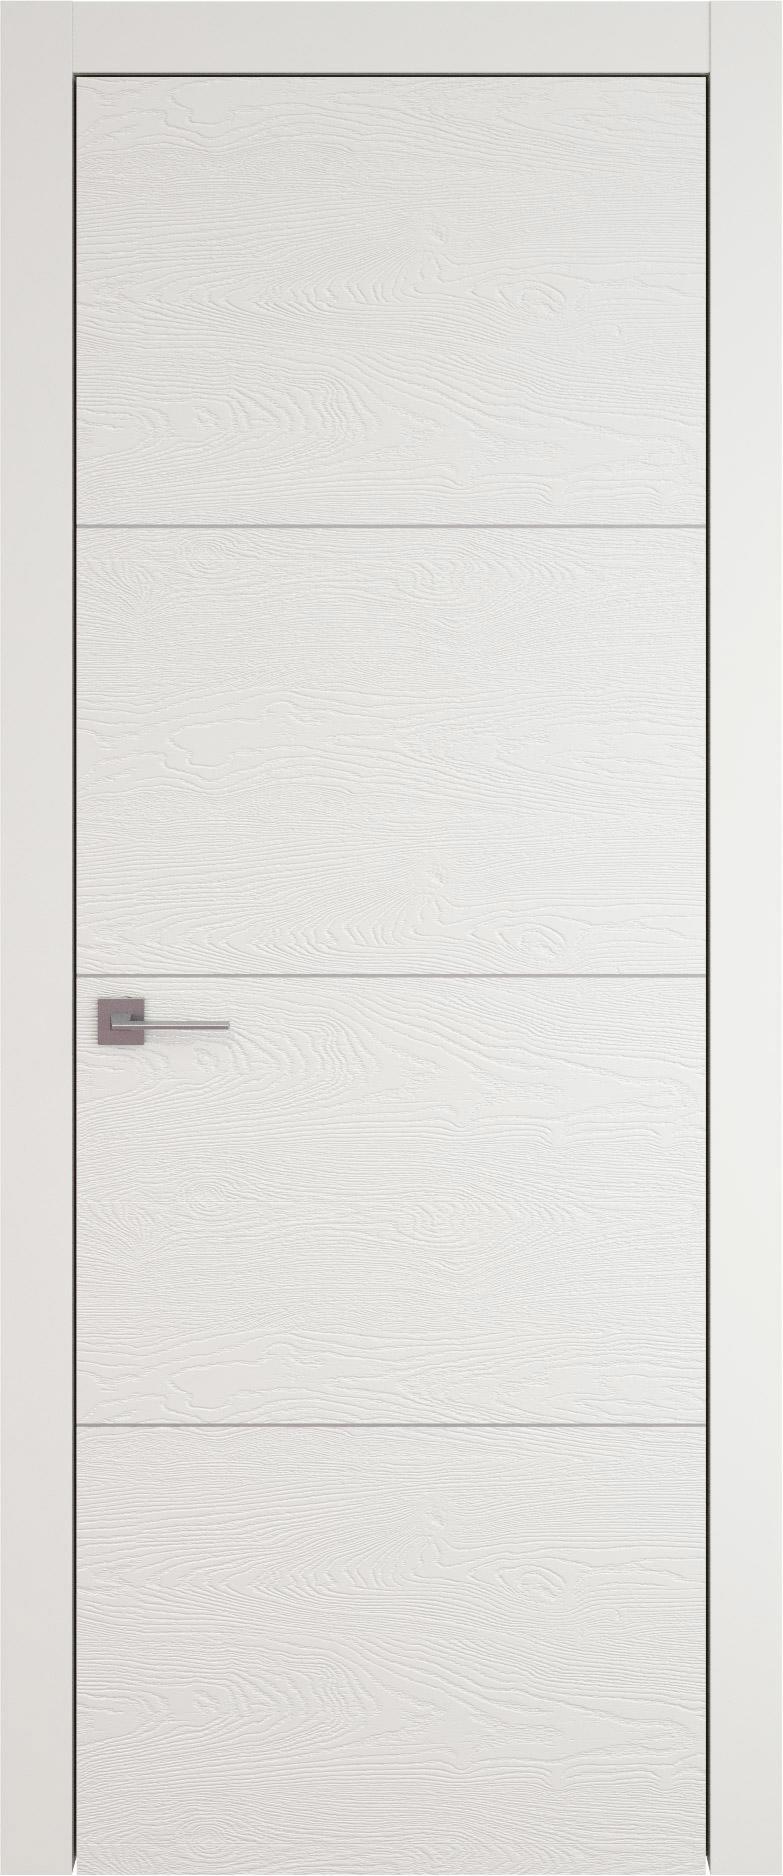 Tivoli Г-2 цвет - Бежевая эмаль по шпону (RAL 9010) Без стекла (ДГ)